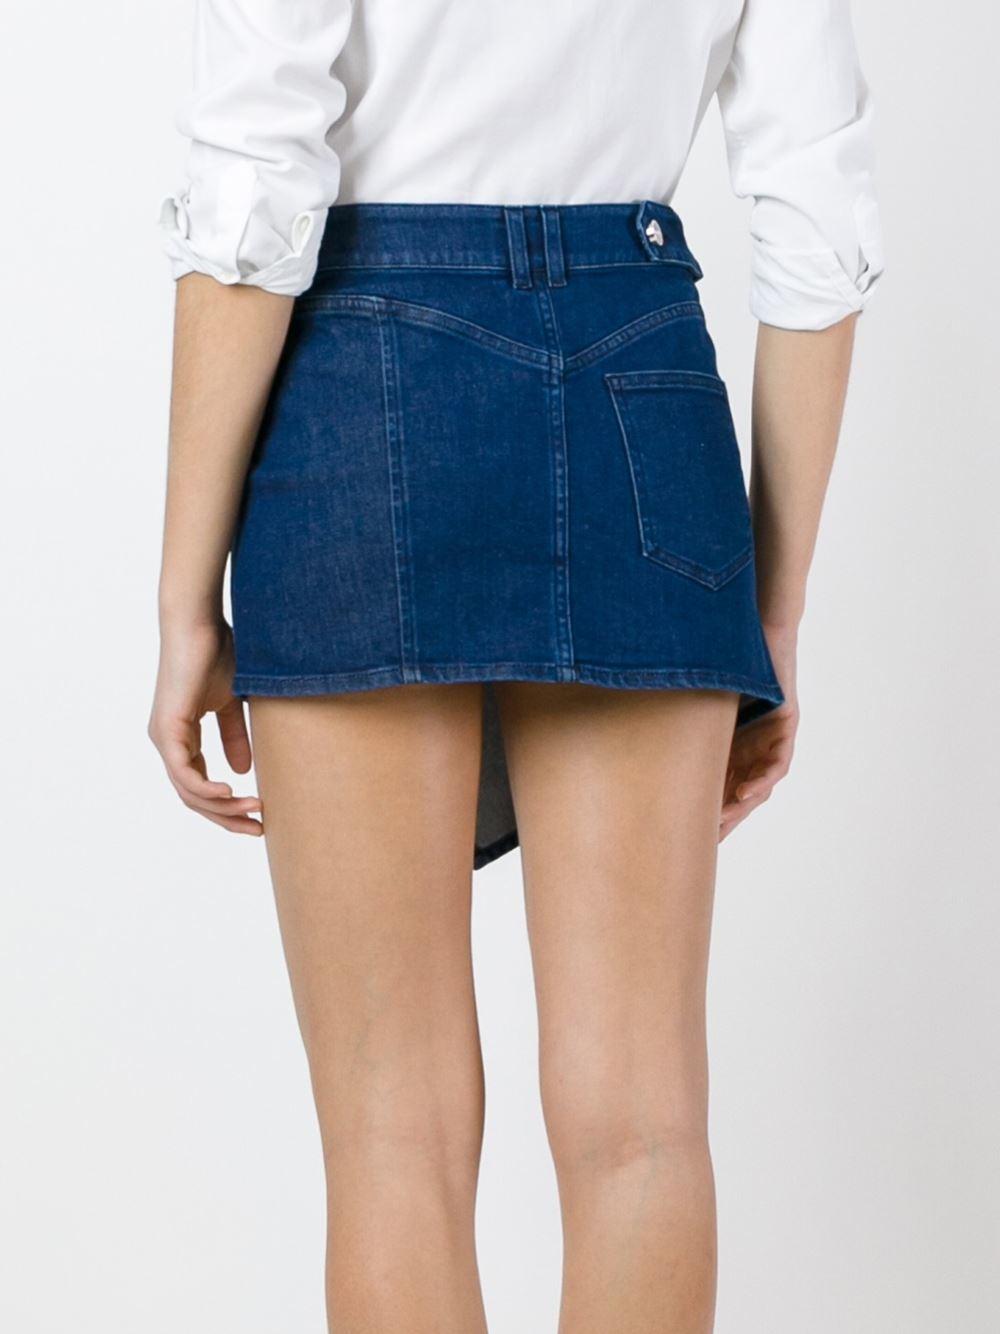 anthony vaccarello denim mini skirt in blue lyst